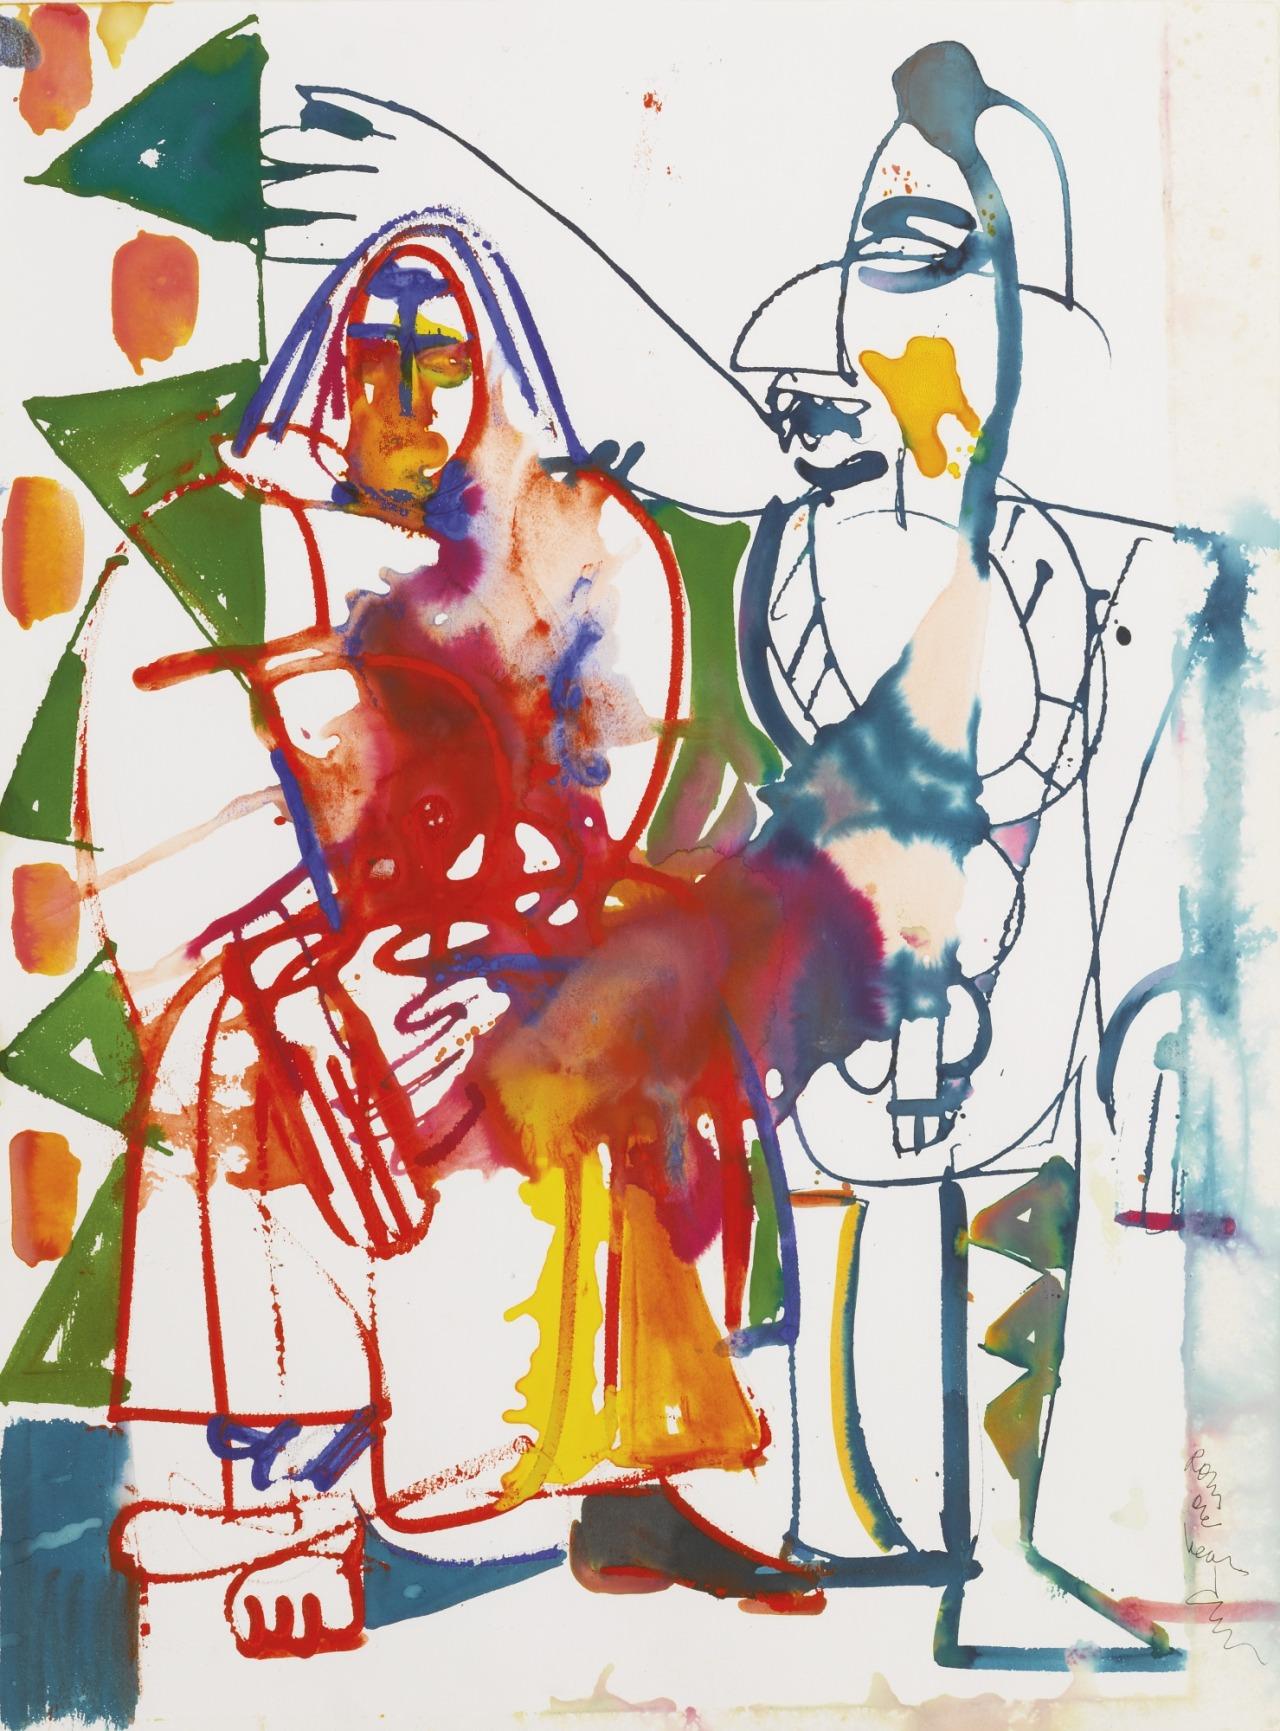 thunderstruck9:  Romare Bearden (American, 1911-1988), Obeah with Bird Loa, 1984. Watercolor on paper, 30 x 22 ¼ in.